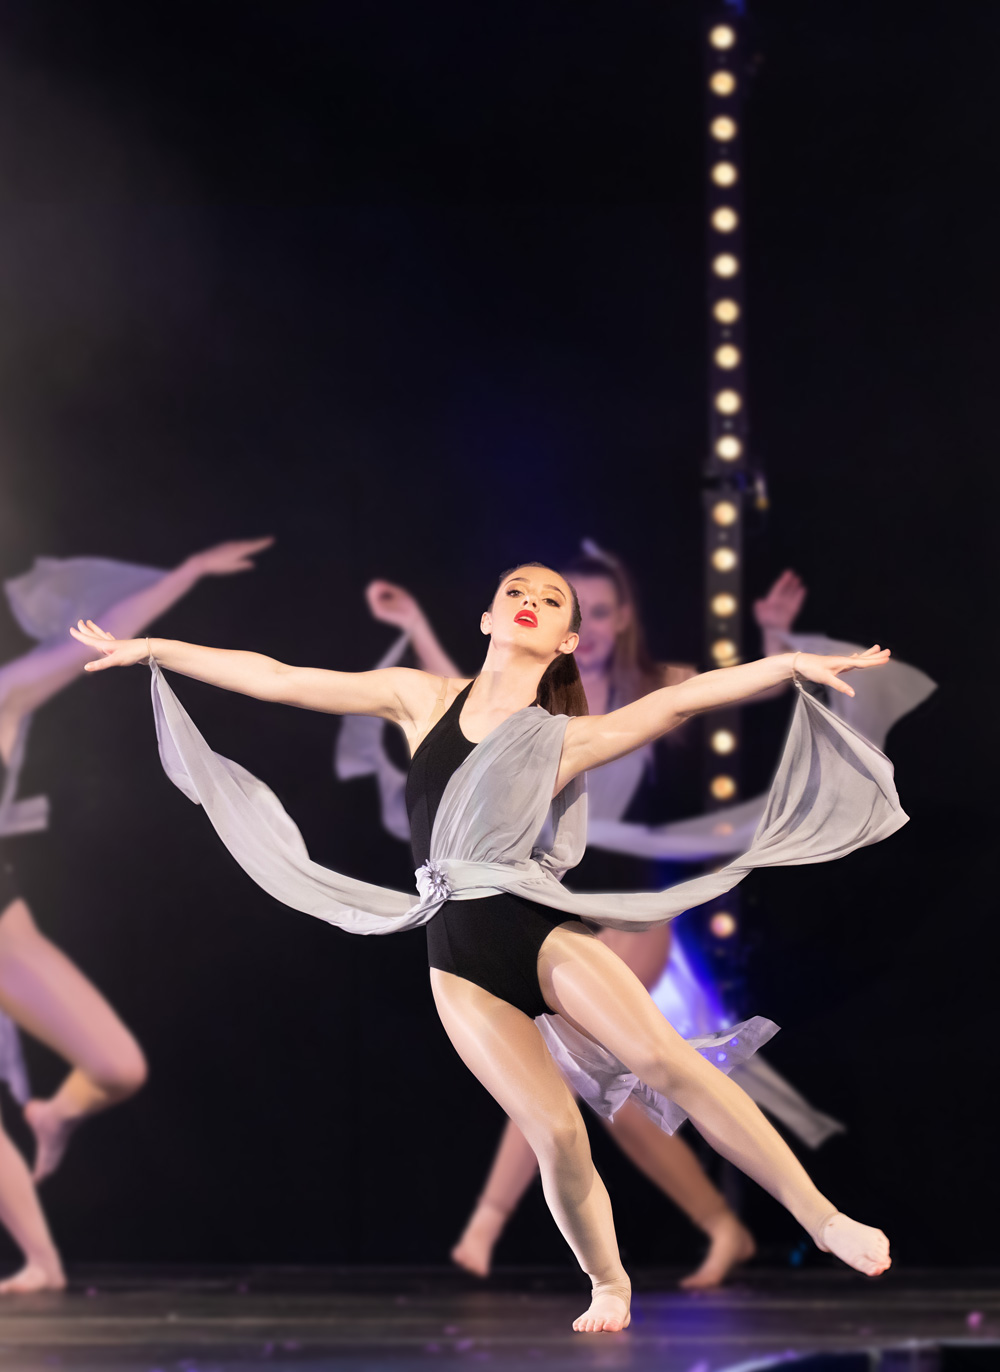 Ballet-Dancer-4